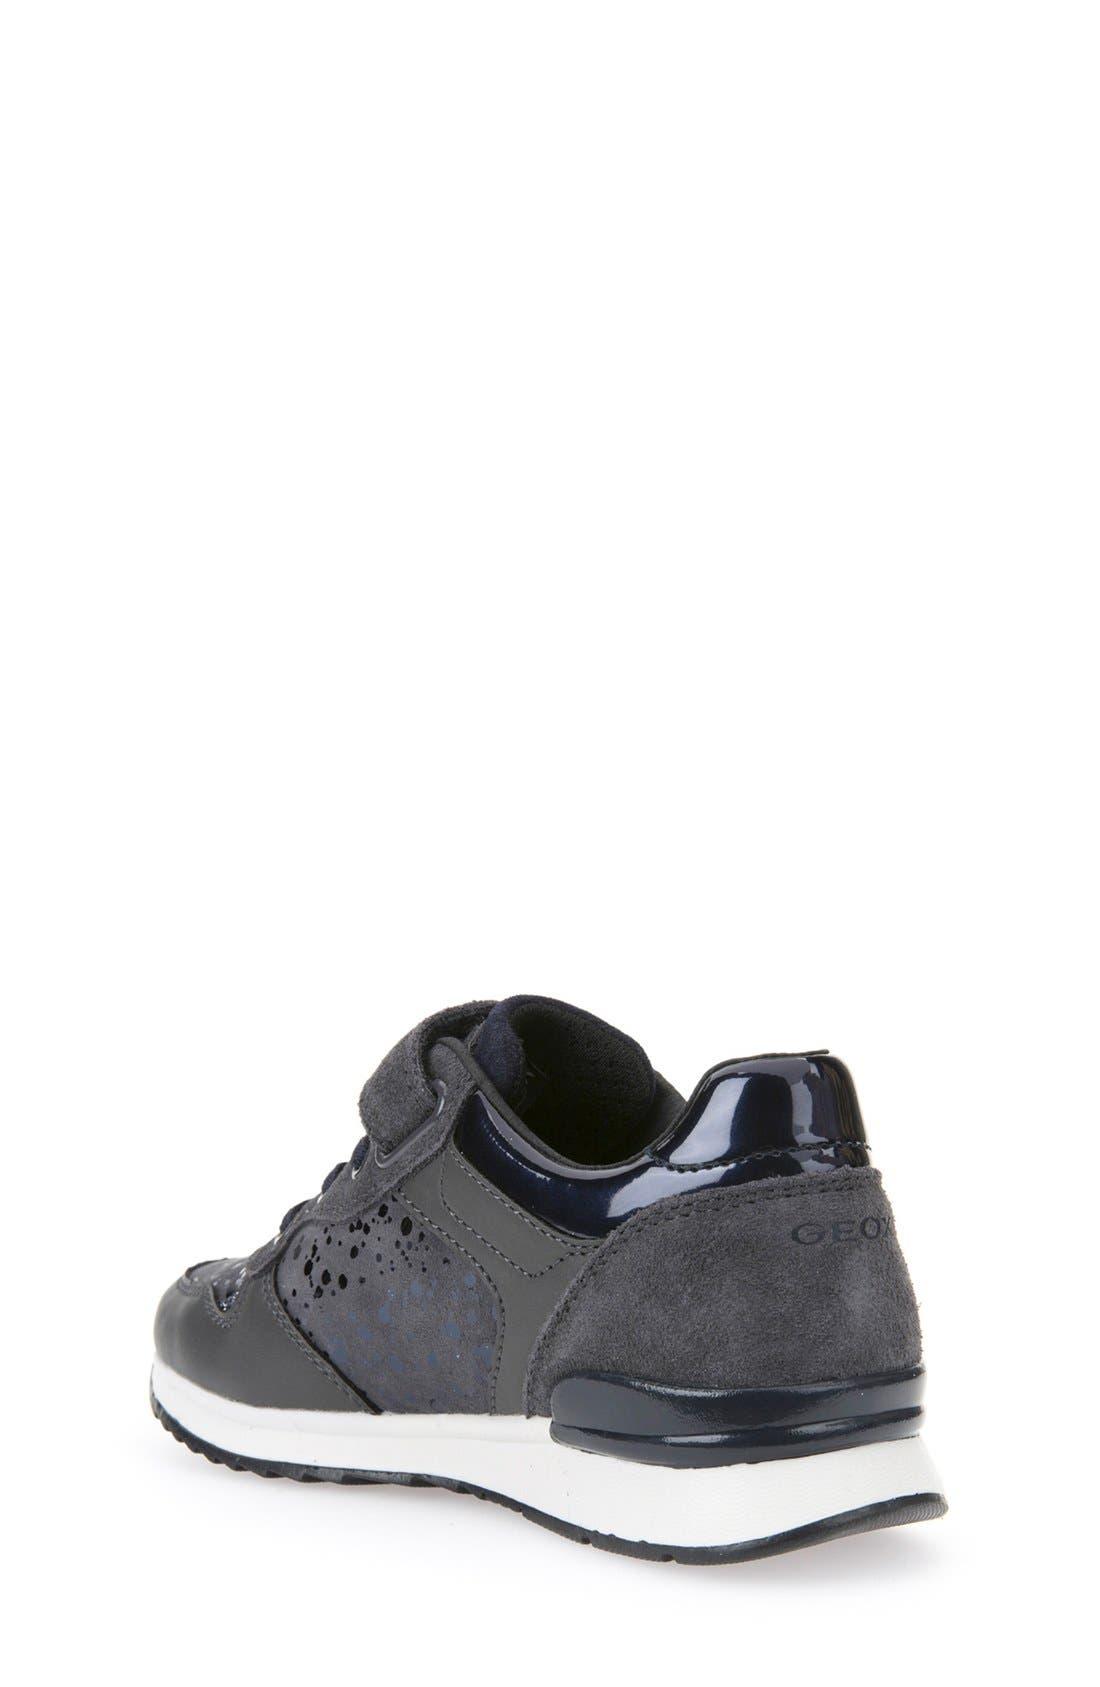 Maisie Sneaker,                             Alternate thumbnail 5, color,                             021